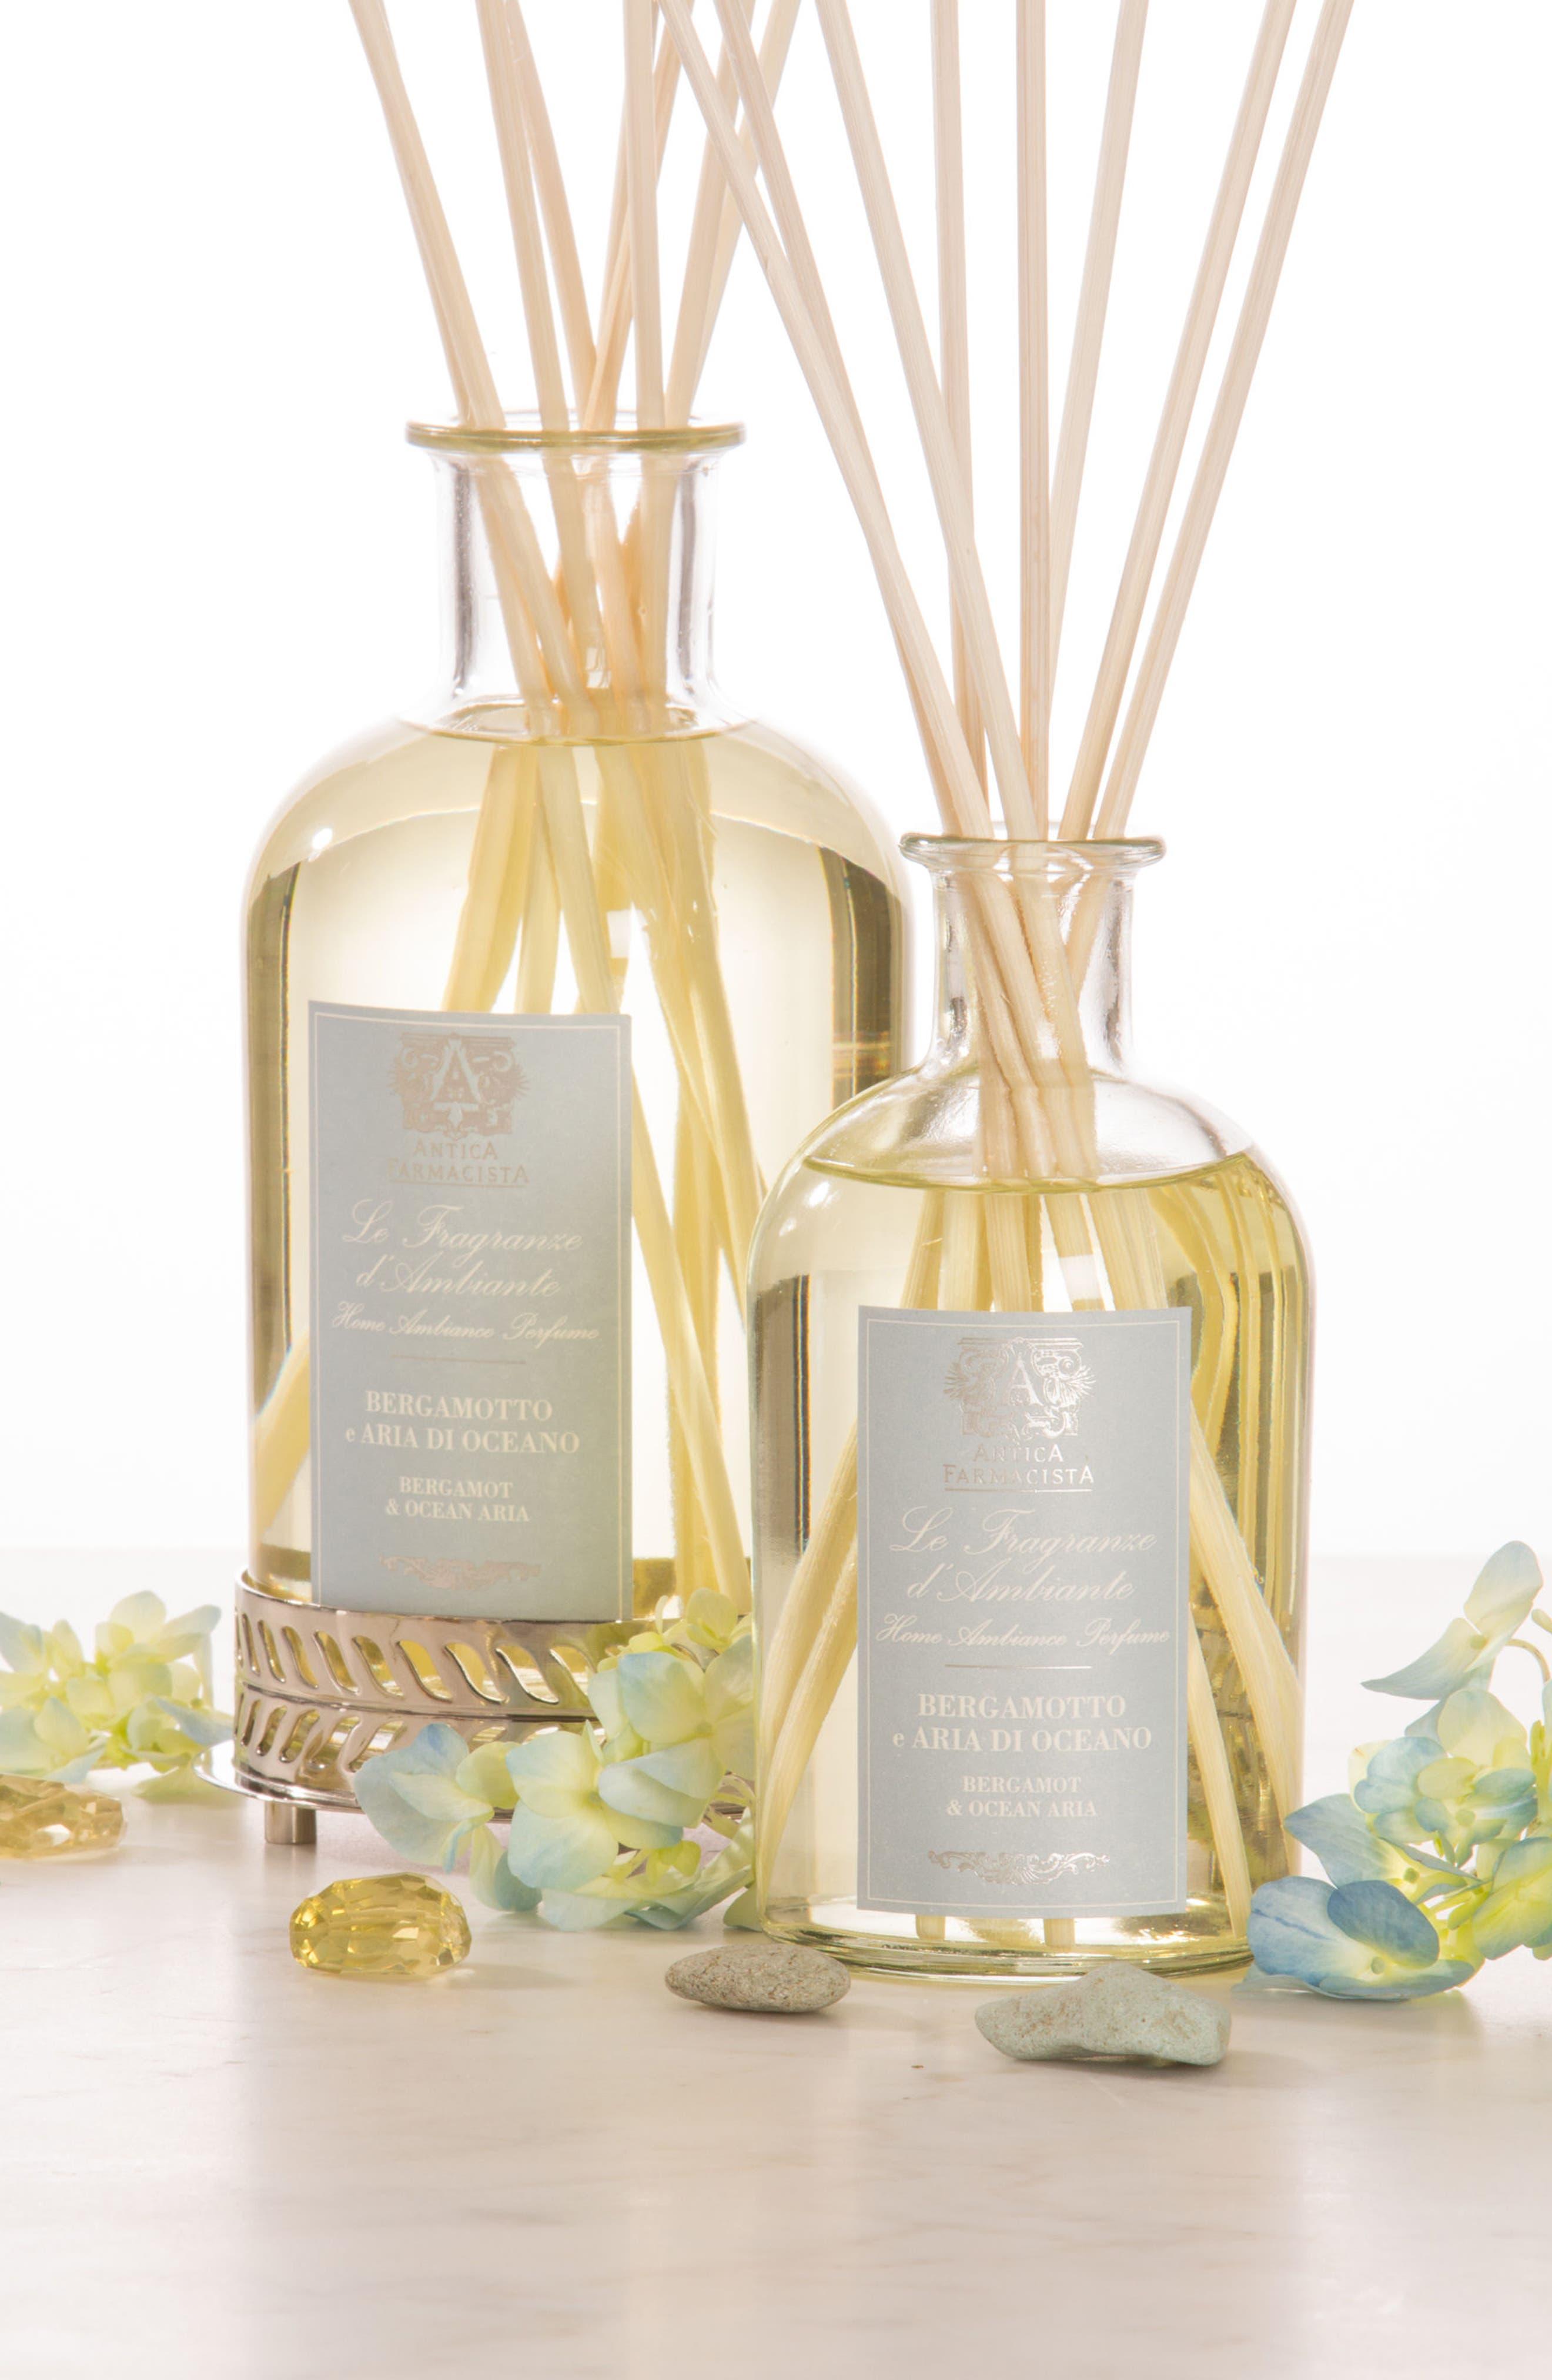 Bergamot & Ocean Aria Home Ambiance Perfume,                             Alternate thumbnail 2, color,                             No Color